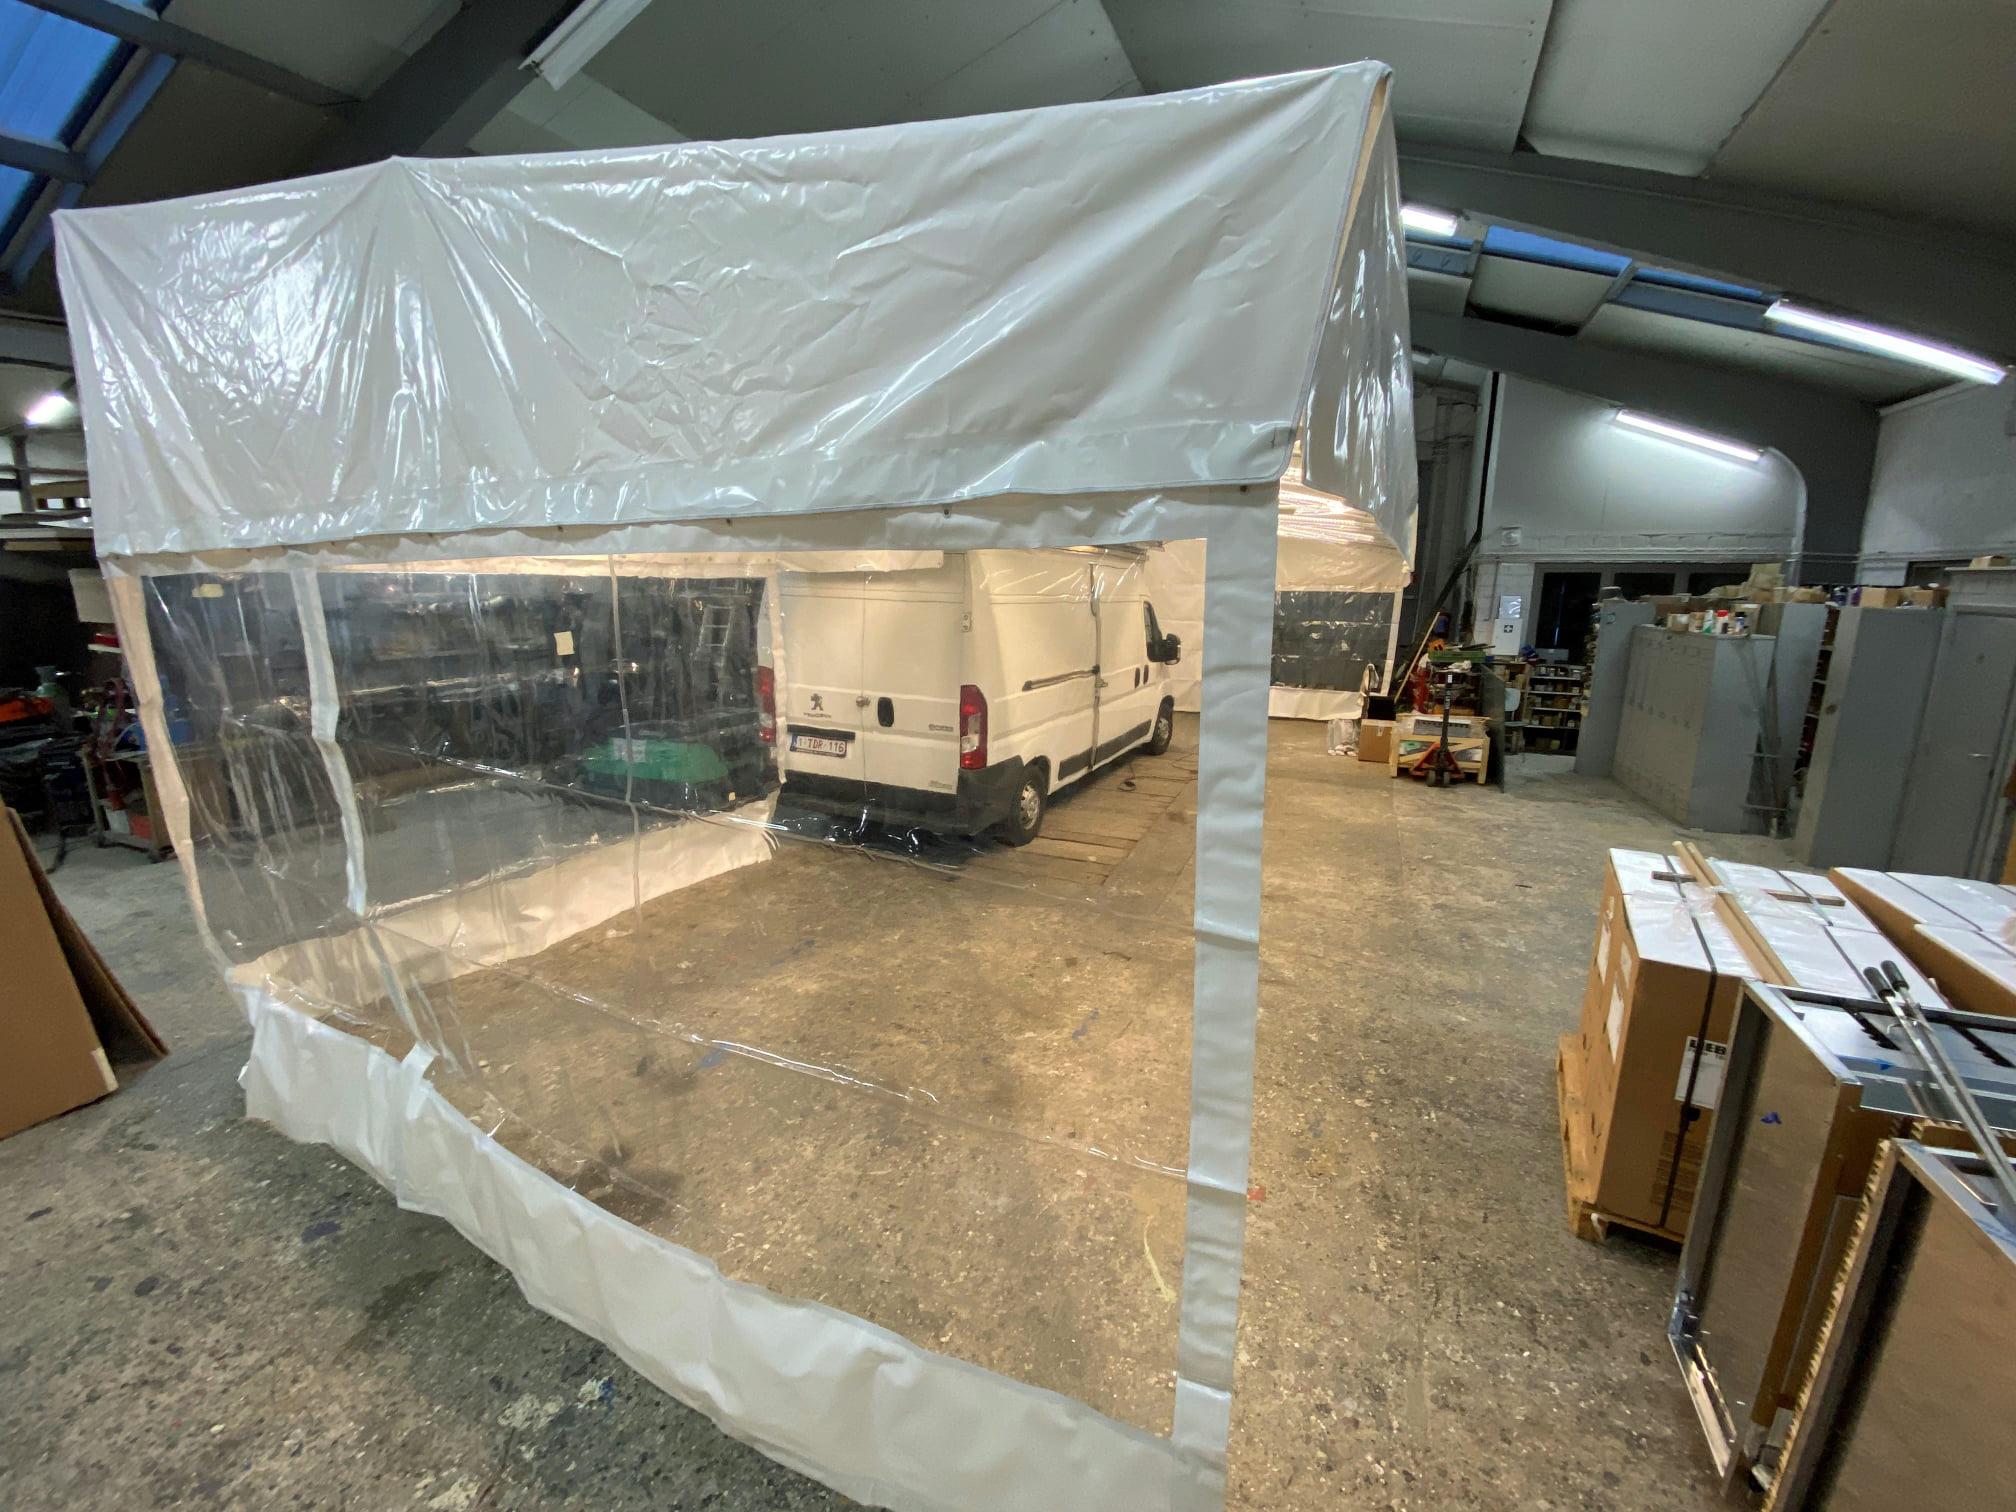 Peugeot-met-tentsysteem-lan-g-12-mtr-breed-4-30--(2)